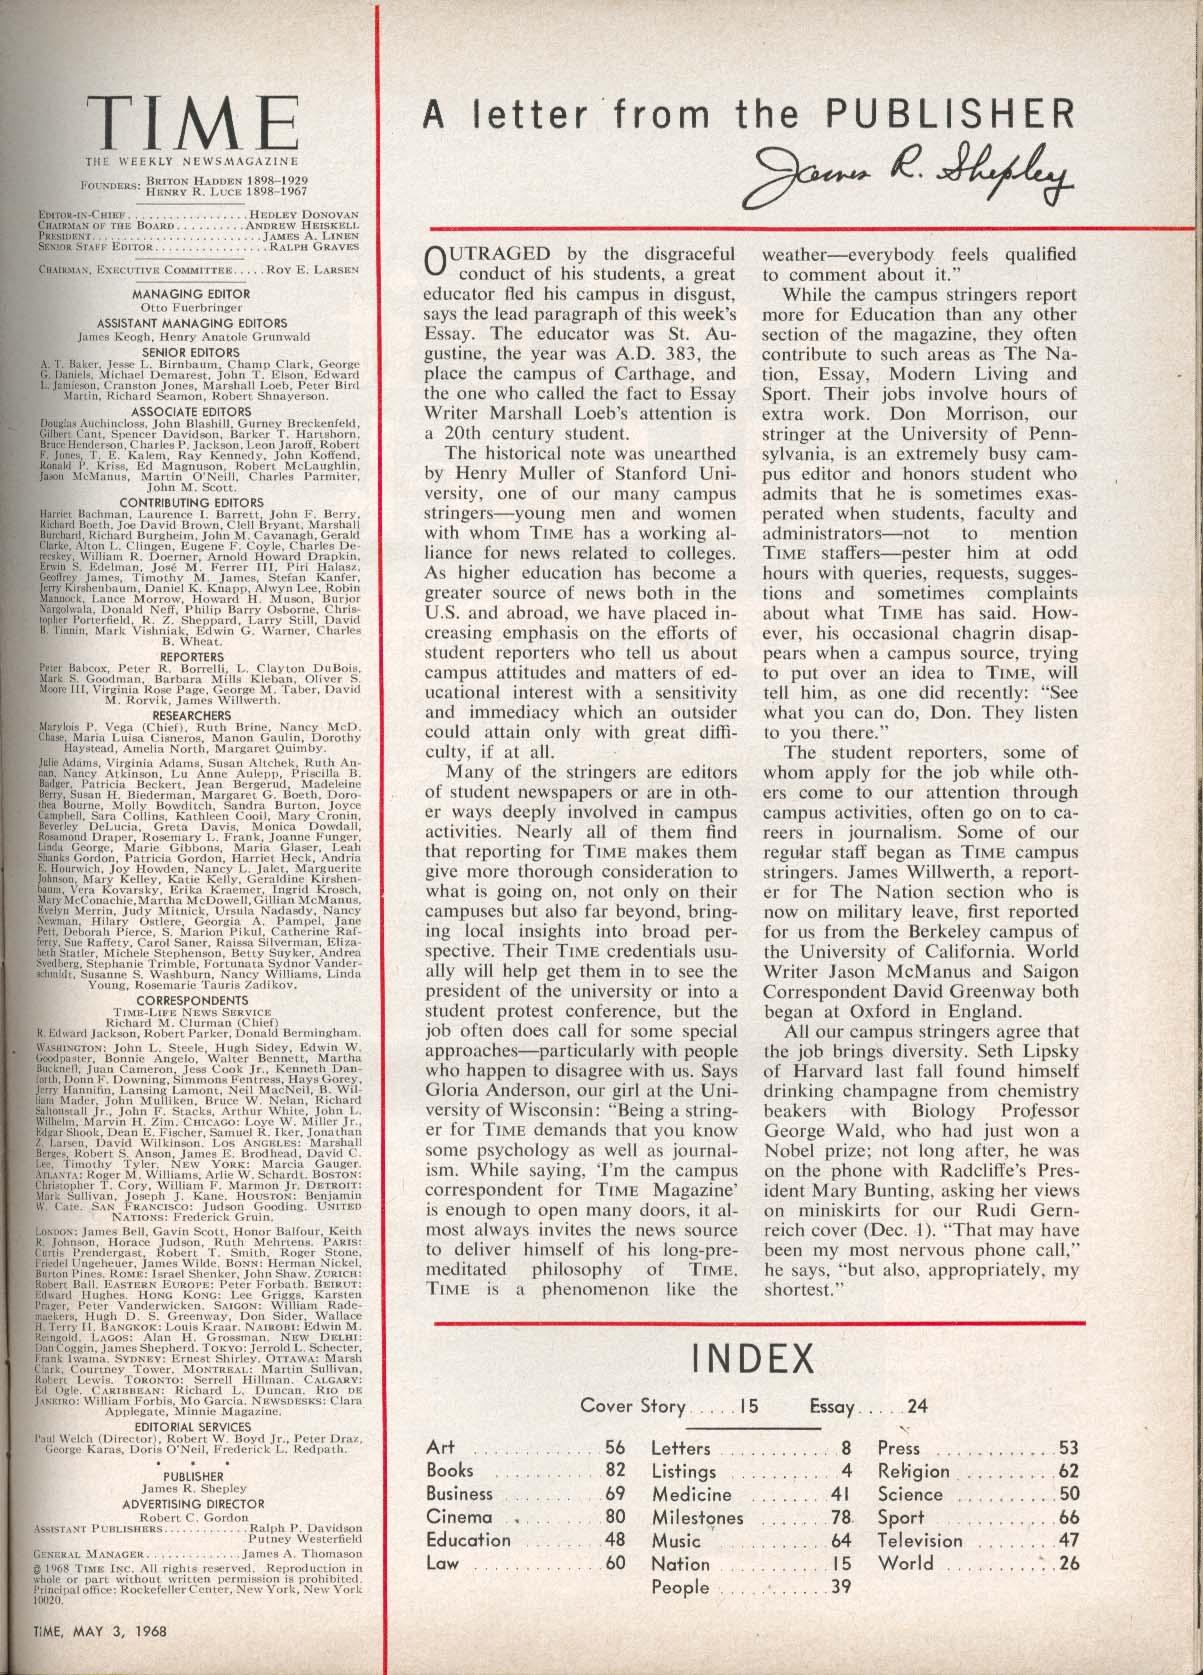 TIME Hubert Humphrey Vietnam Viet Cong Israel 20th Anniversary 5/3 1968